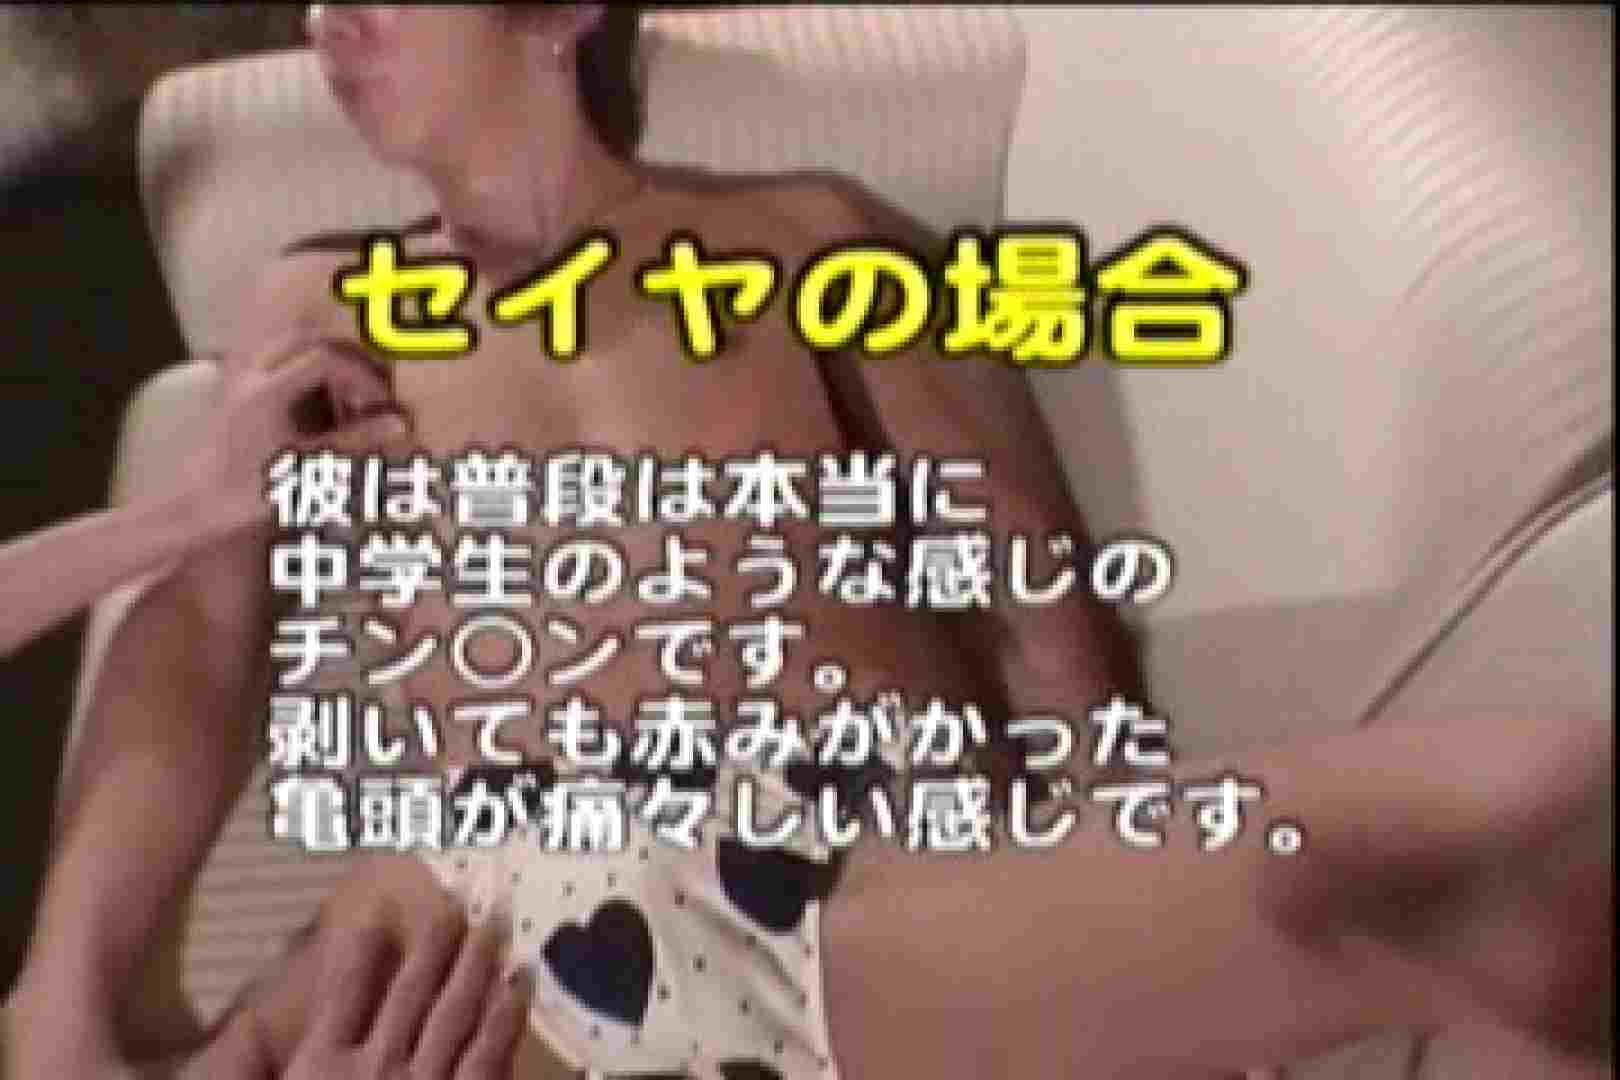 BABY FACEな包茎事情!!4FACEの快楽 フェラ ゲイ素人エロ画像 104枚 7